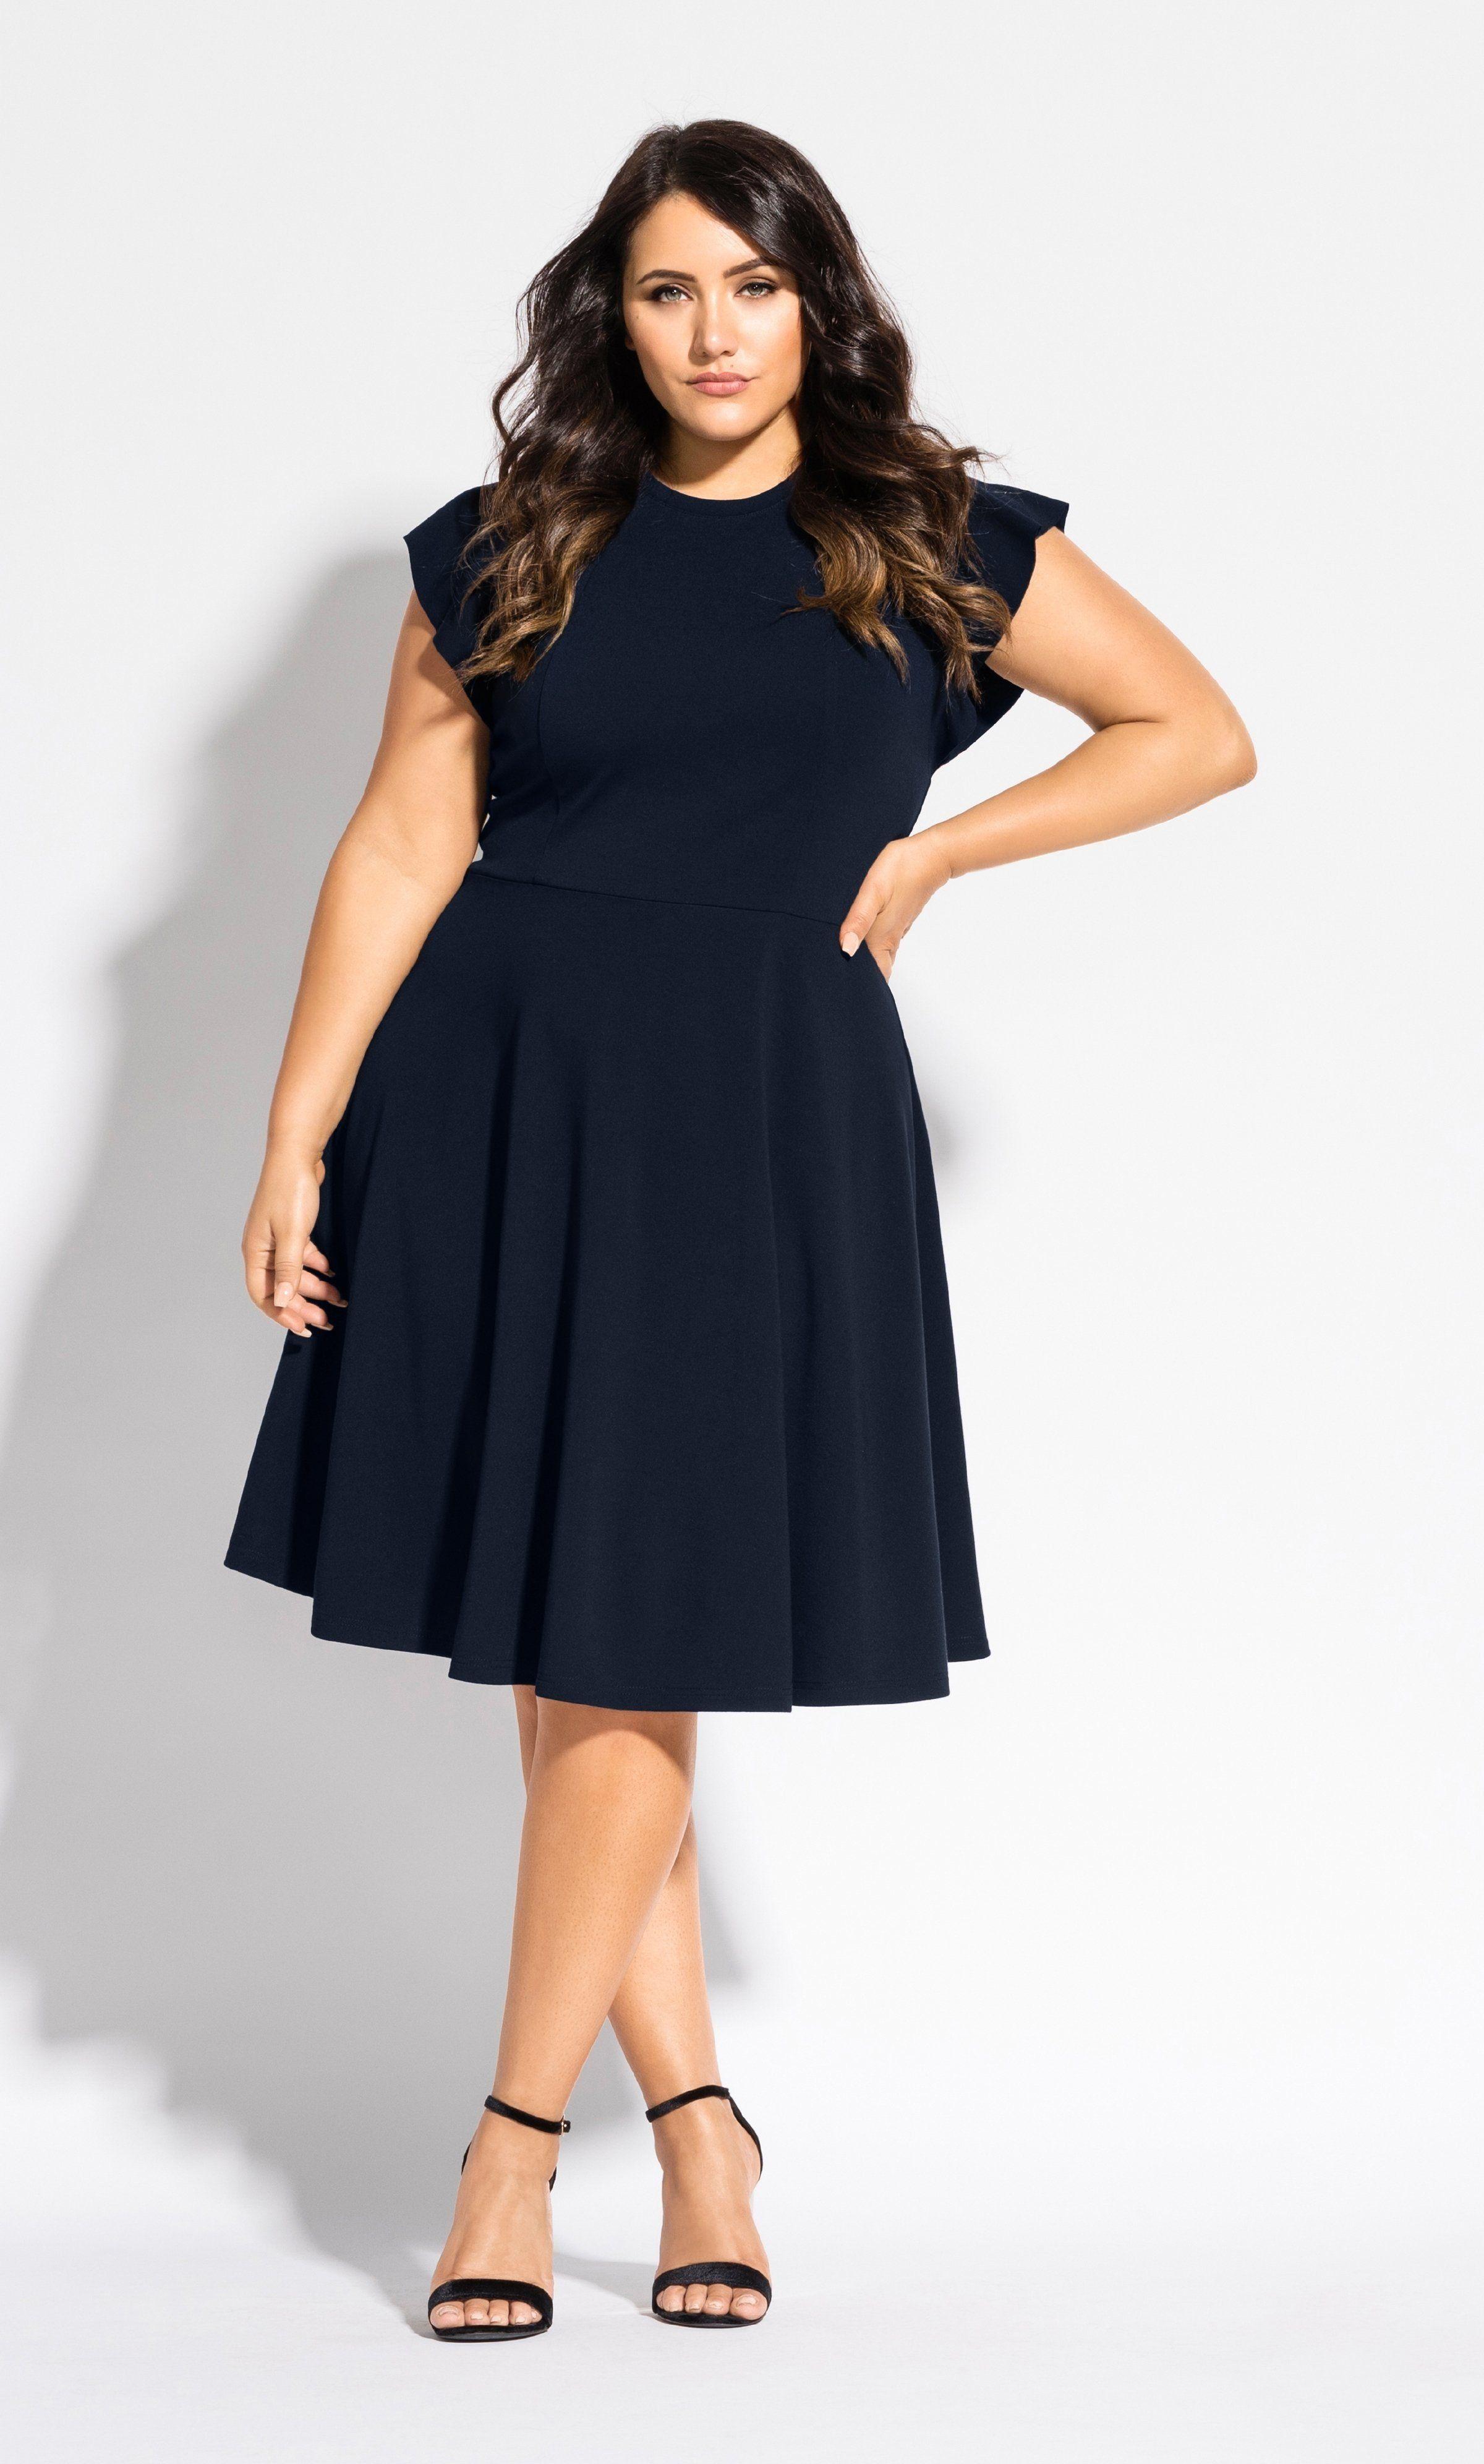 Frill Shoulder Dress Navy Plus Size Work Dresses Plus Size Black Dresses Plus Size Dresses